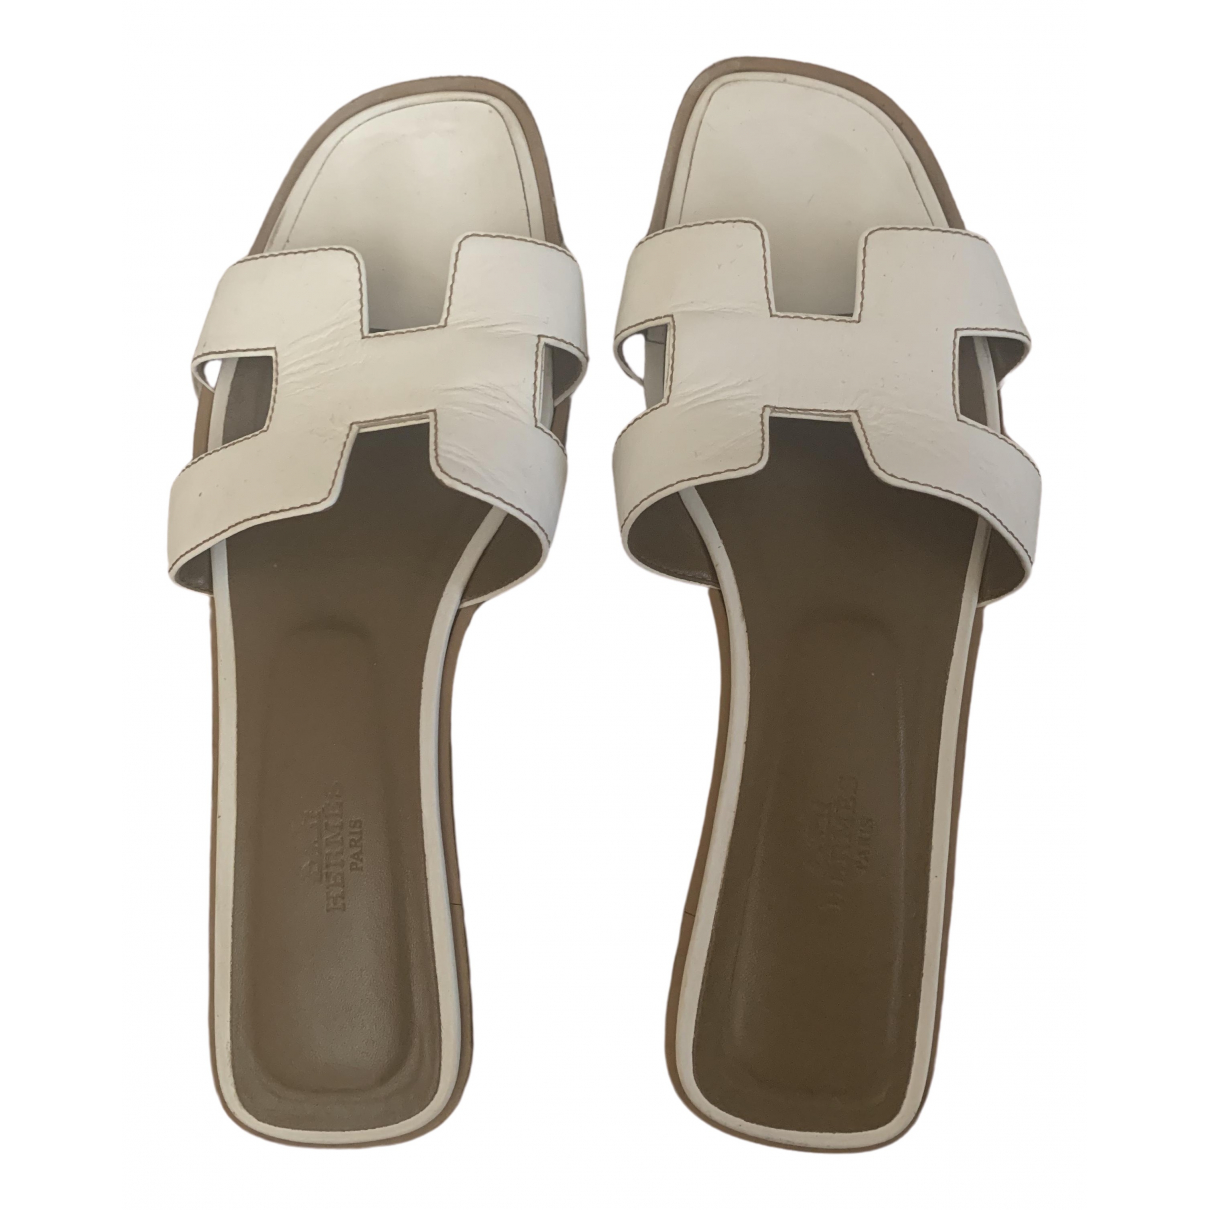 Hermès Oran White Leather Sandals for Women 39.5 EU